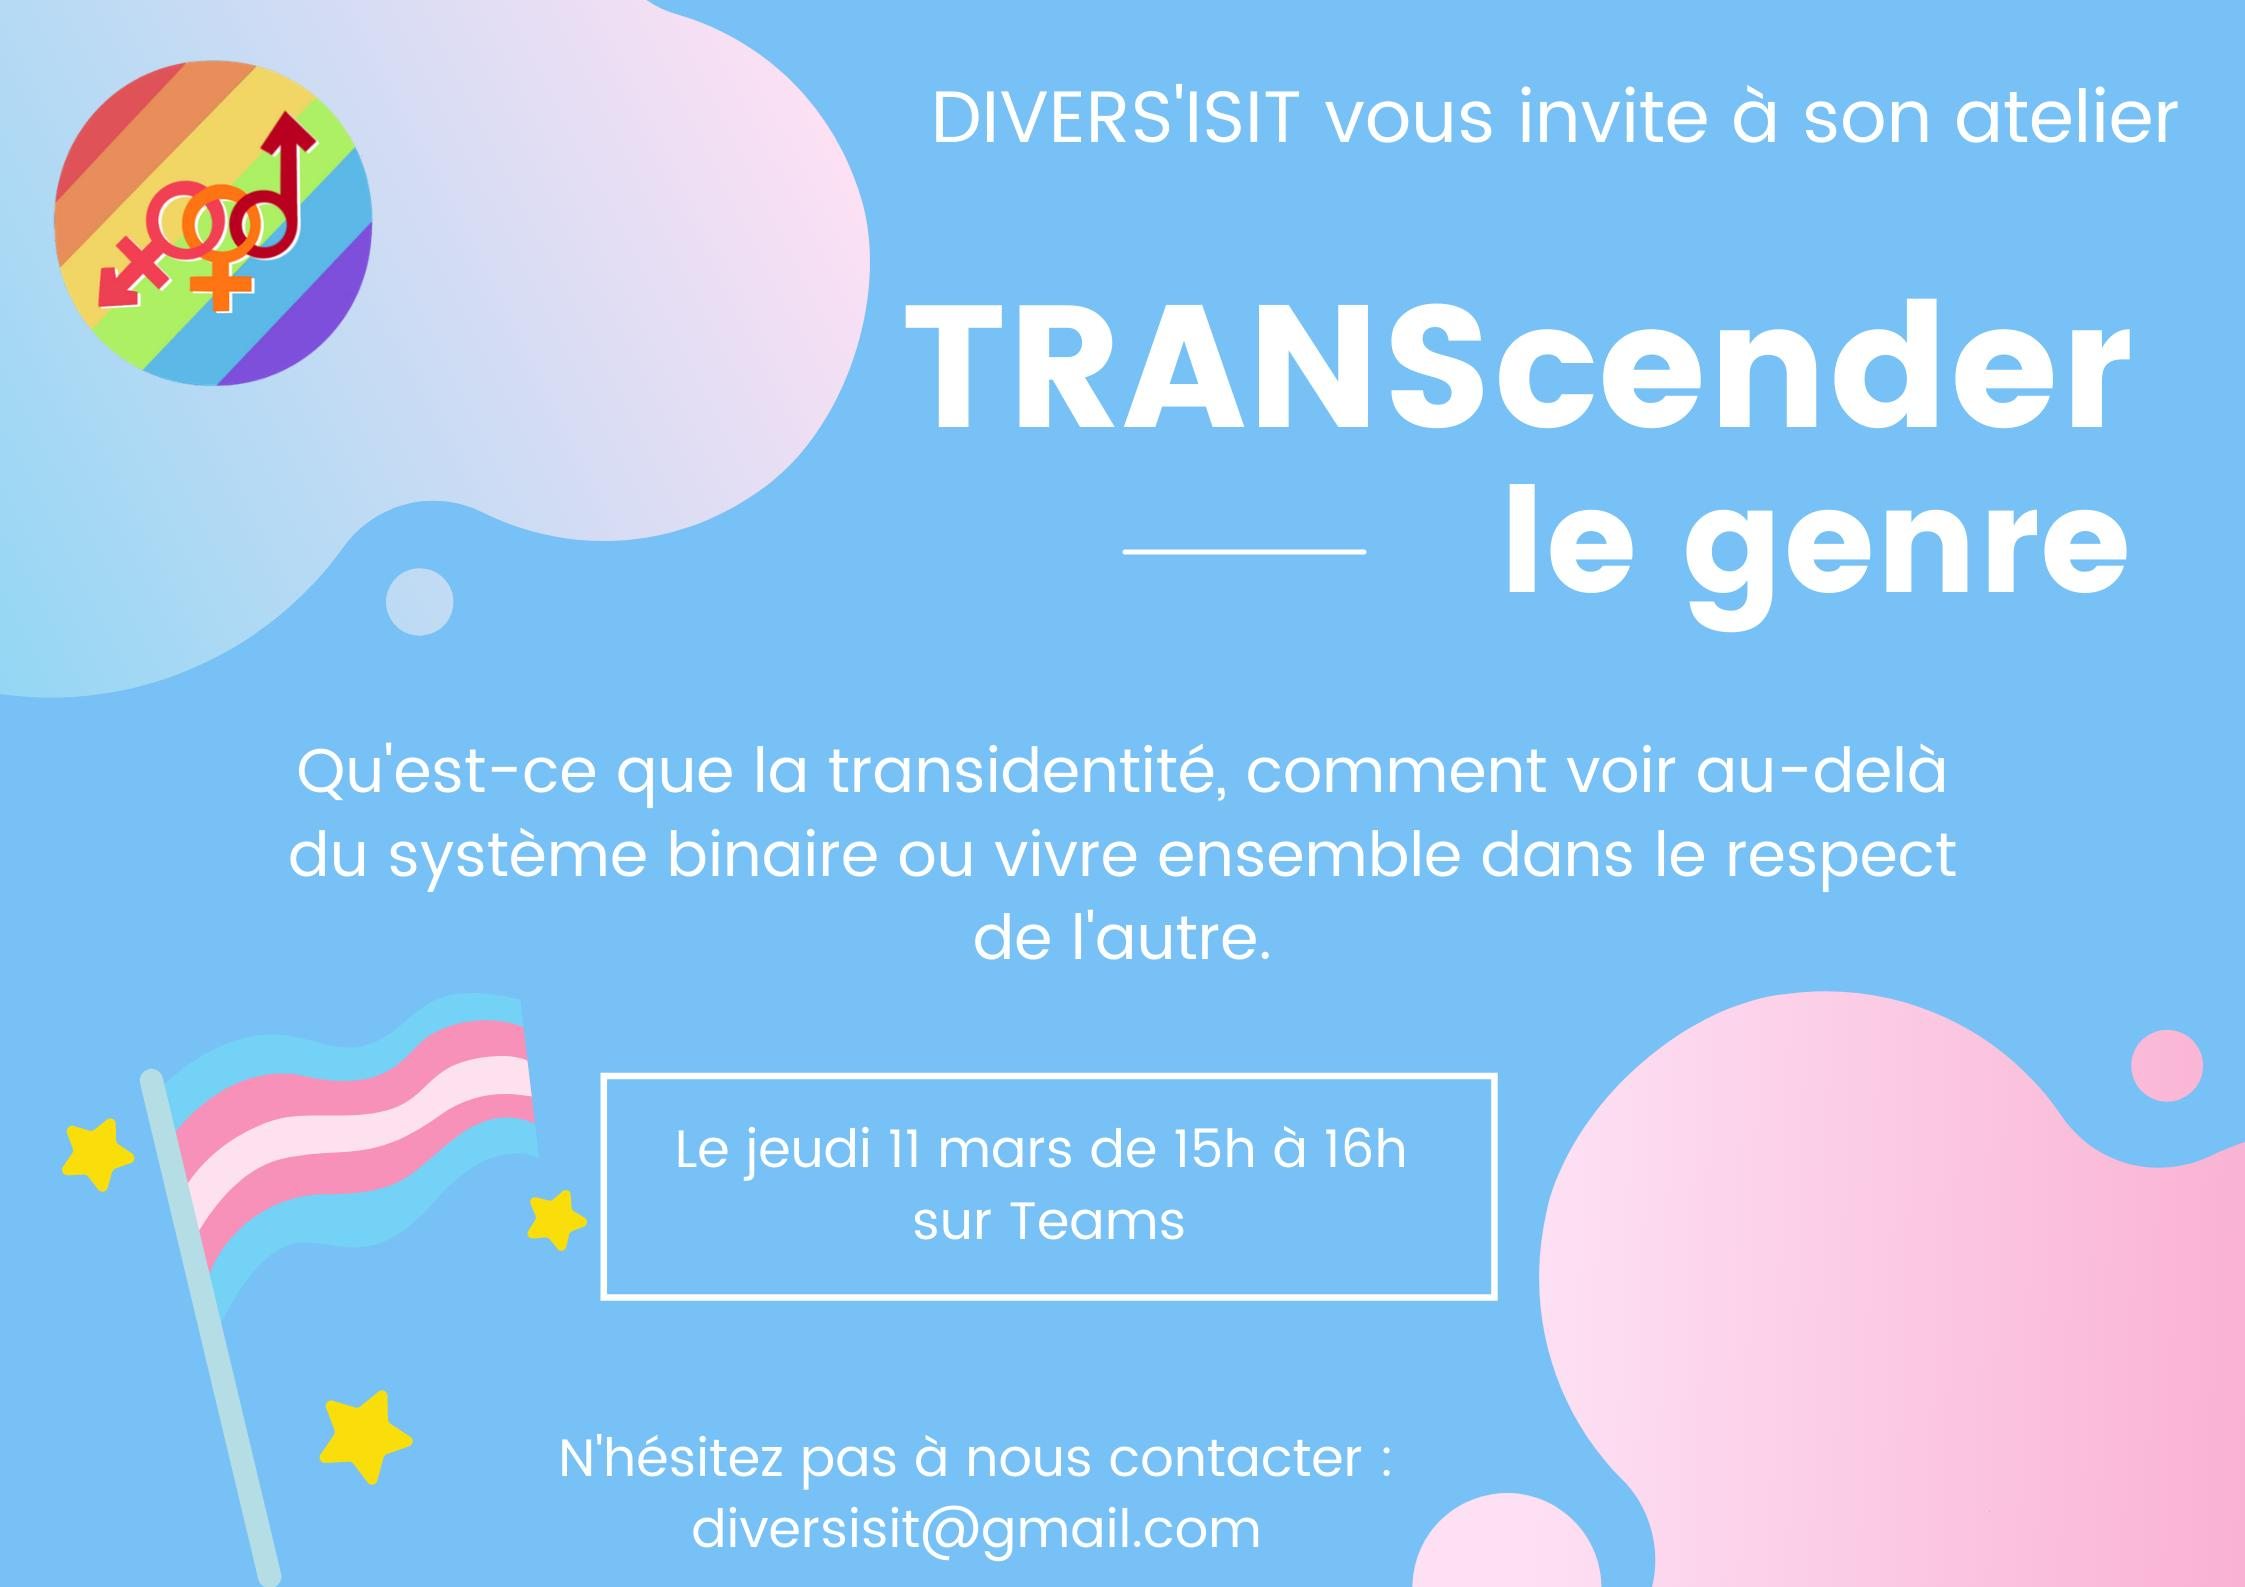 DIVERS'ISIT : TRANScender le genre